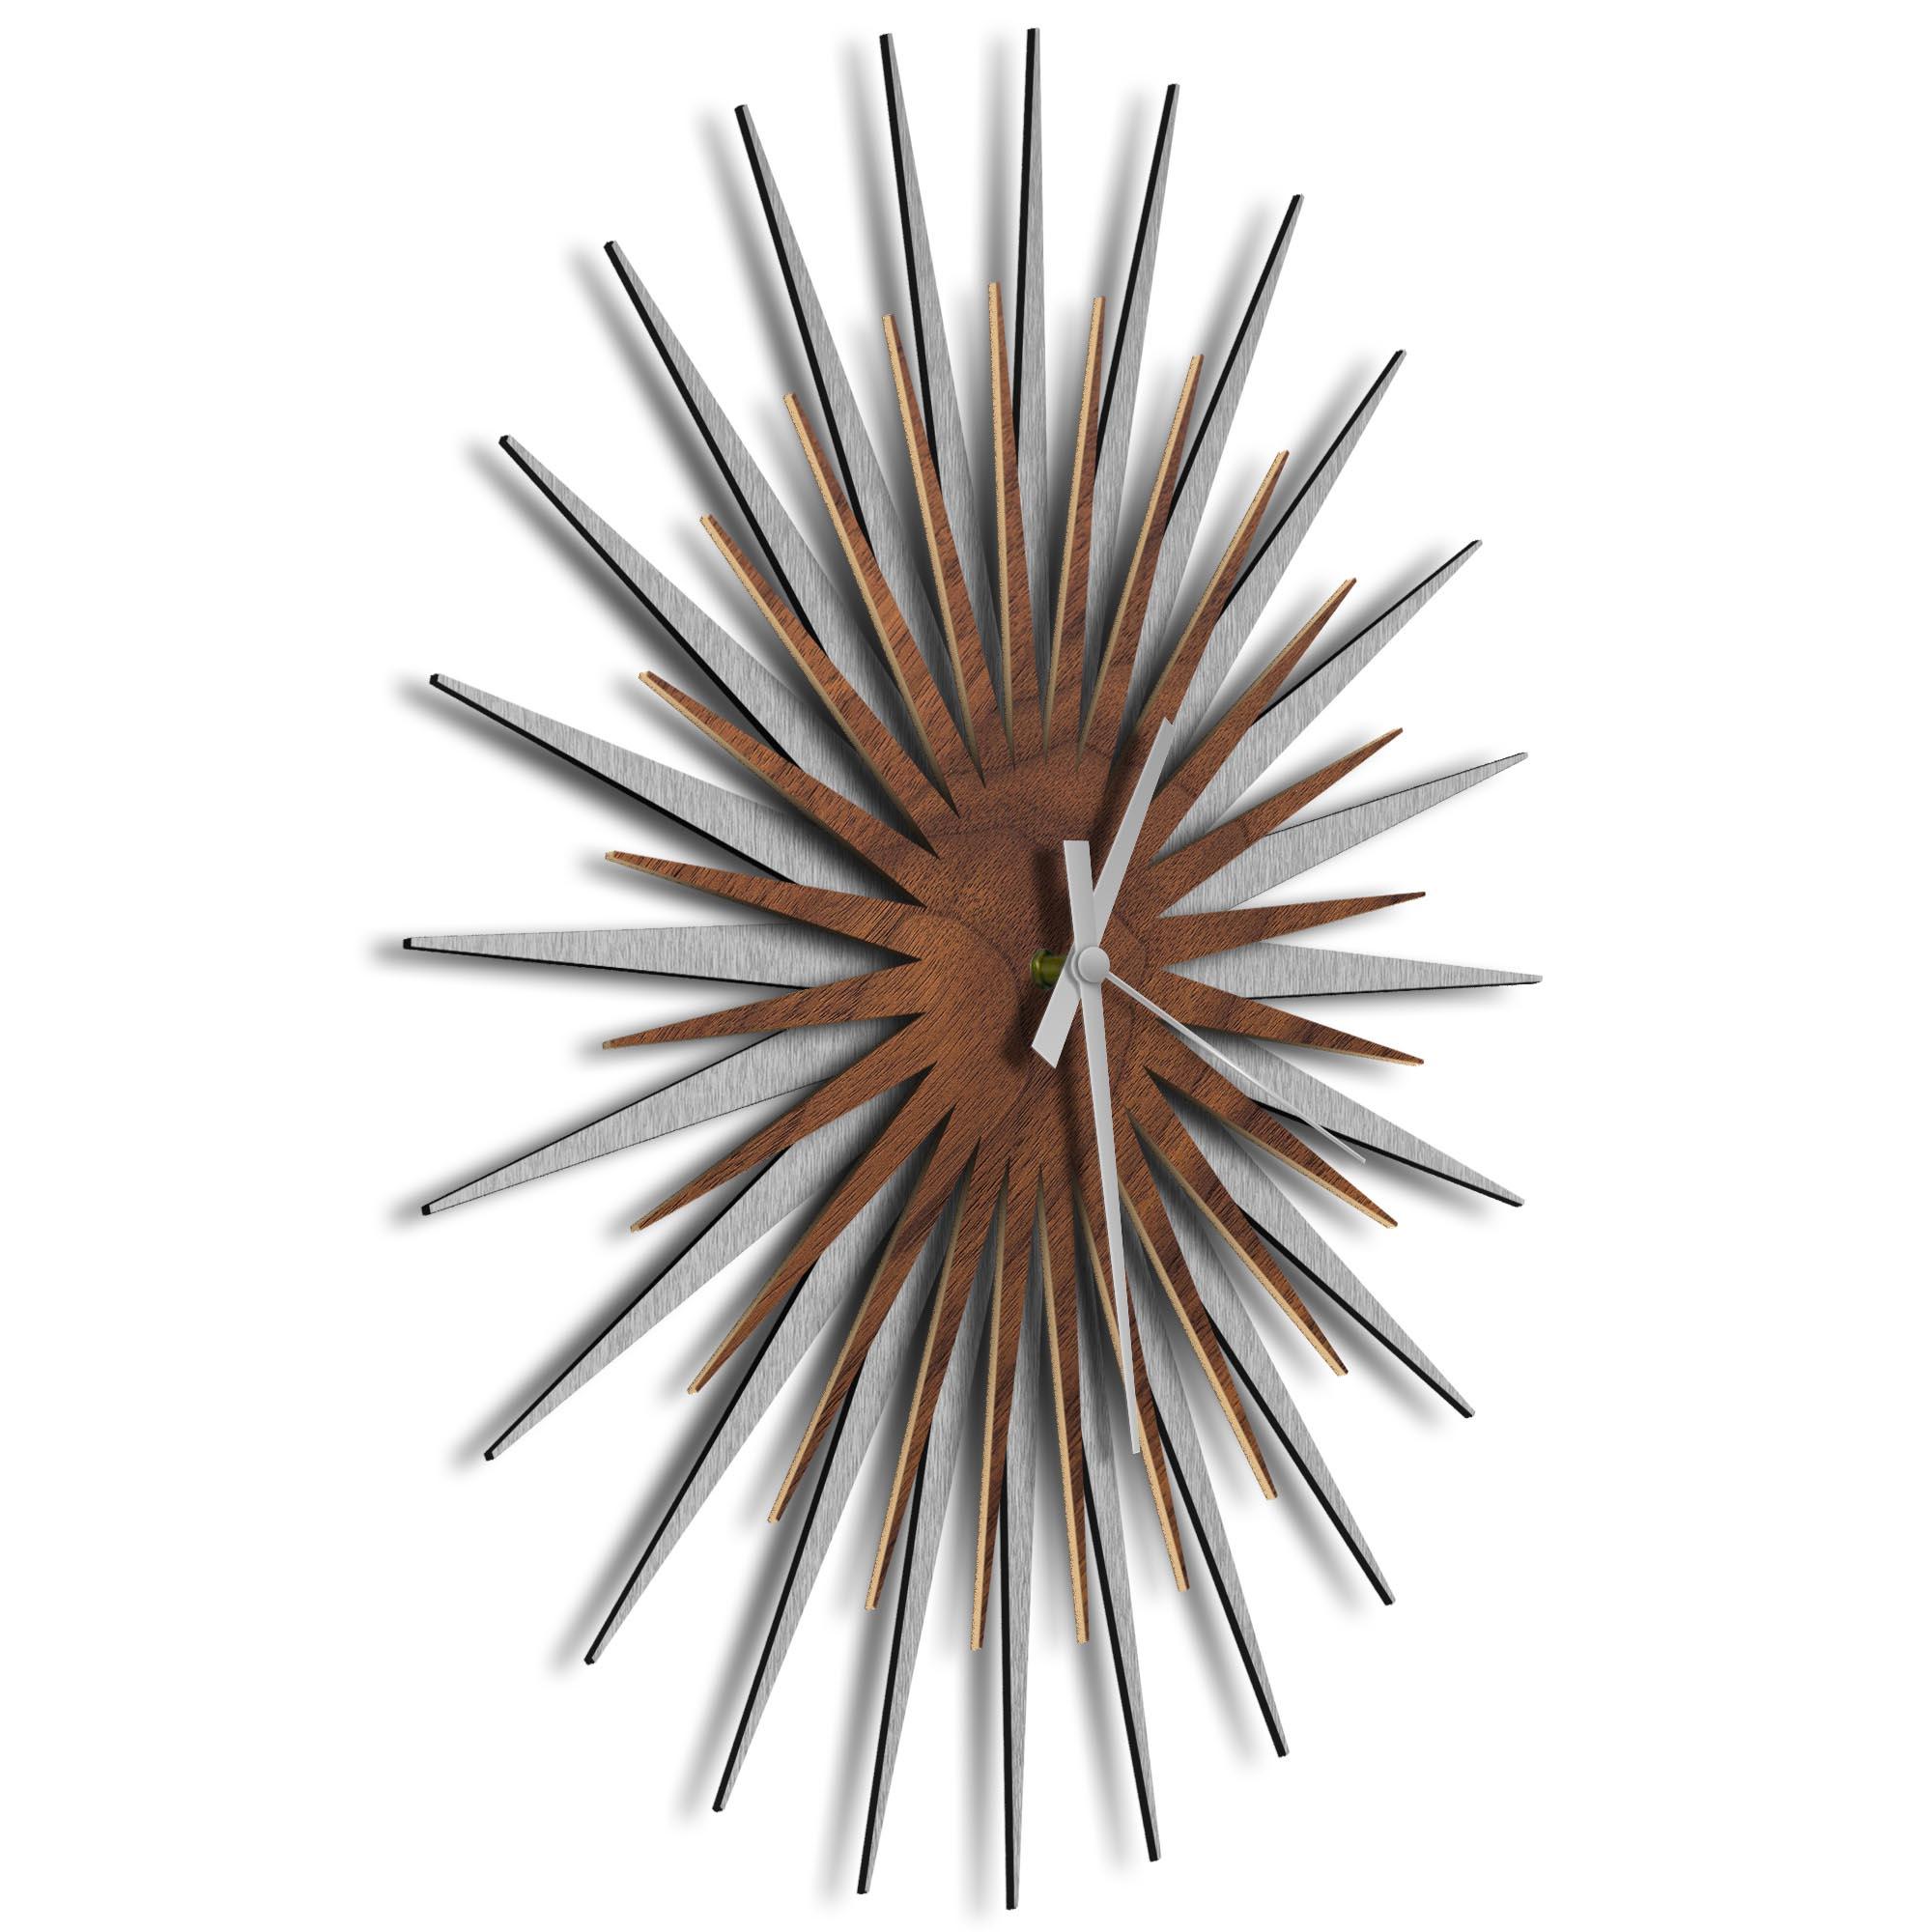 Atomic Era Clock Silver Walnut Grey by Adam Schwoeppe - Mid-Century Modern Clock on Brushed Silver Polymetal - Image 2